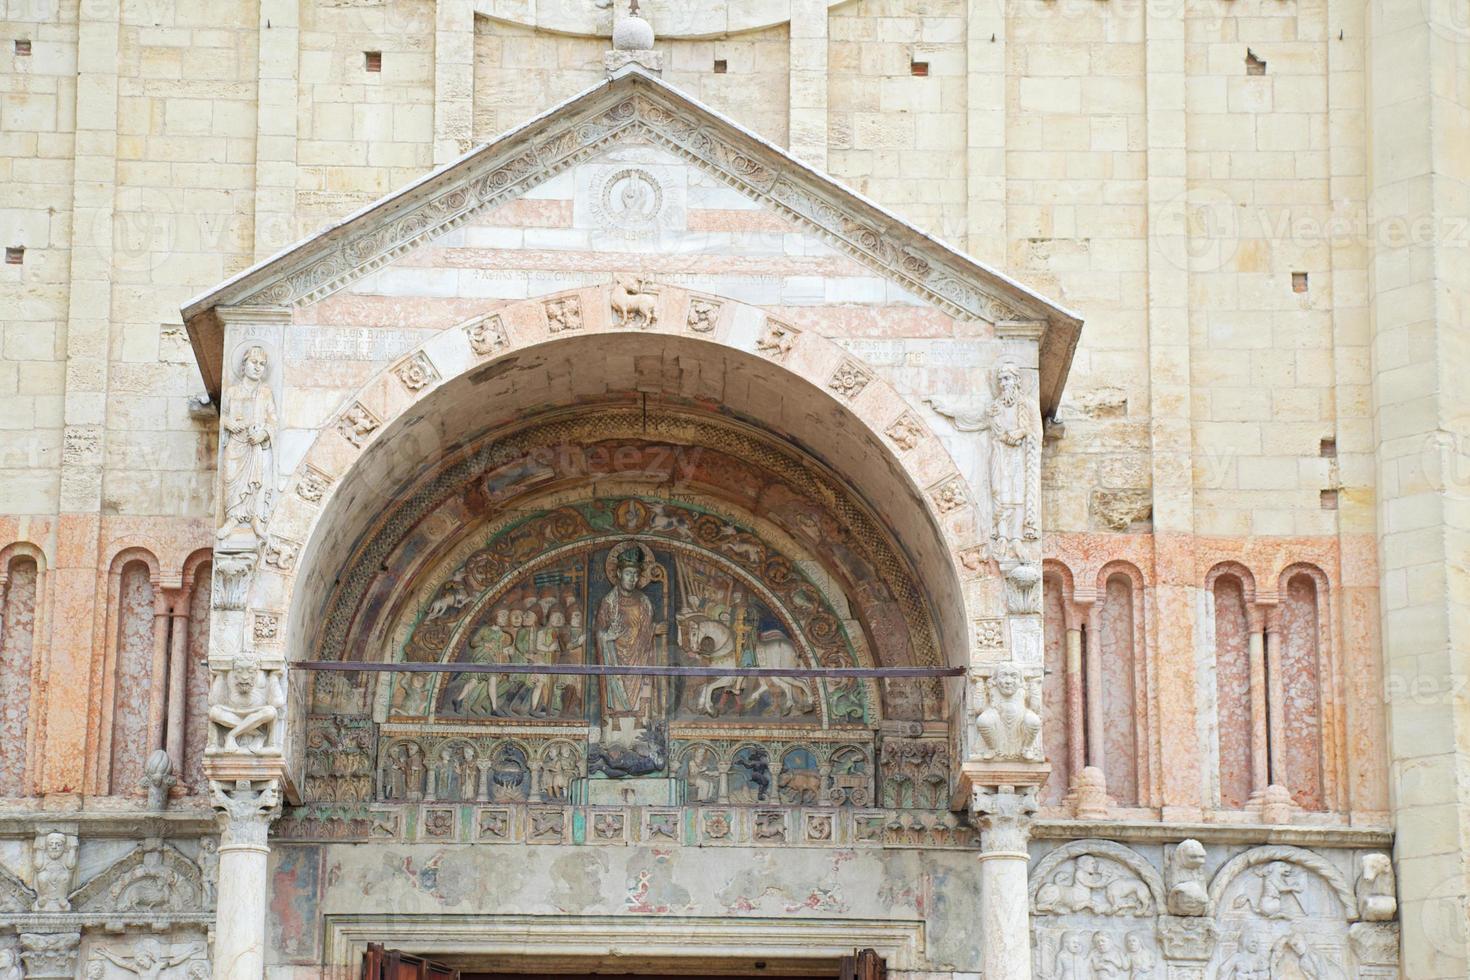 Detalle de la iglesia de San Zeno Maggiore, Verona, Italia. foto